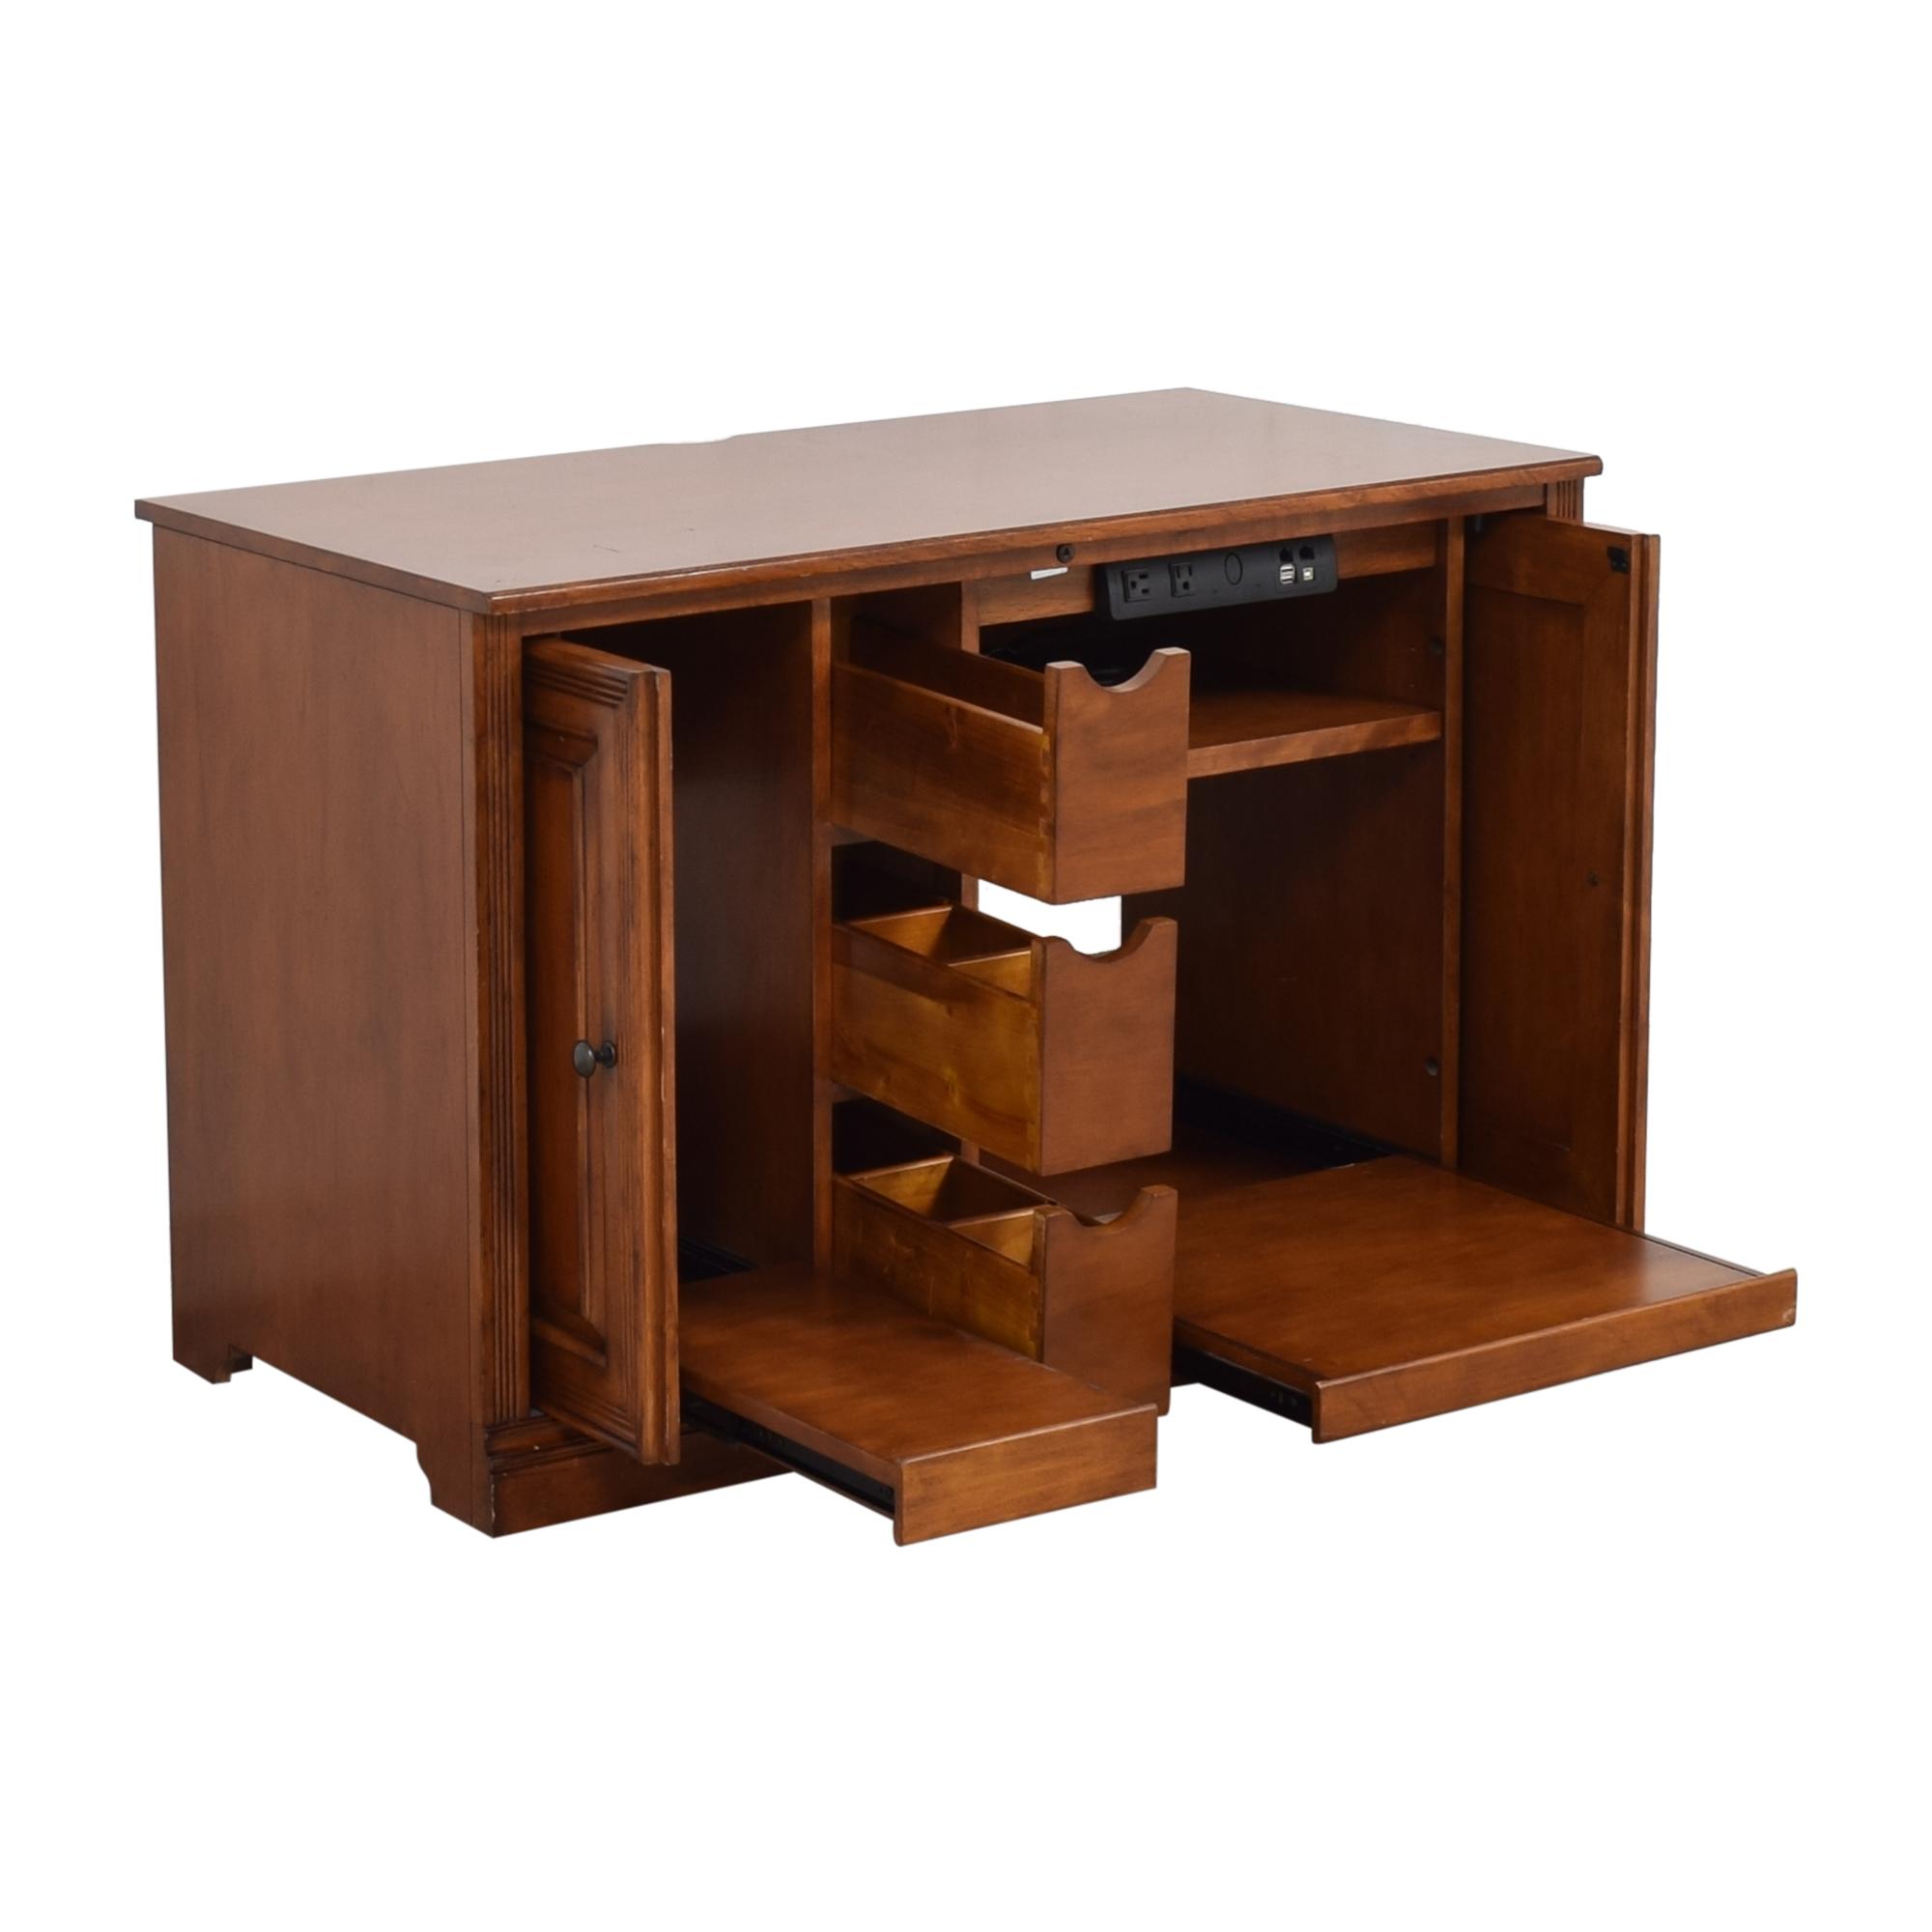 Sligh Furniture Sligh Furniture Home Office Cabinet